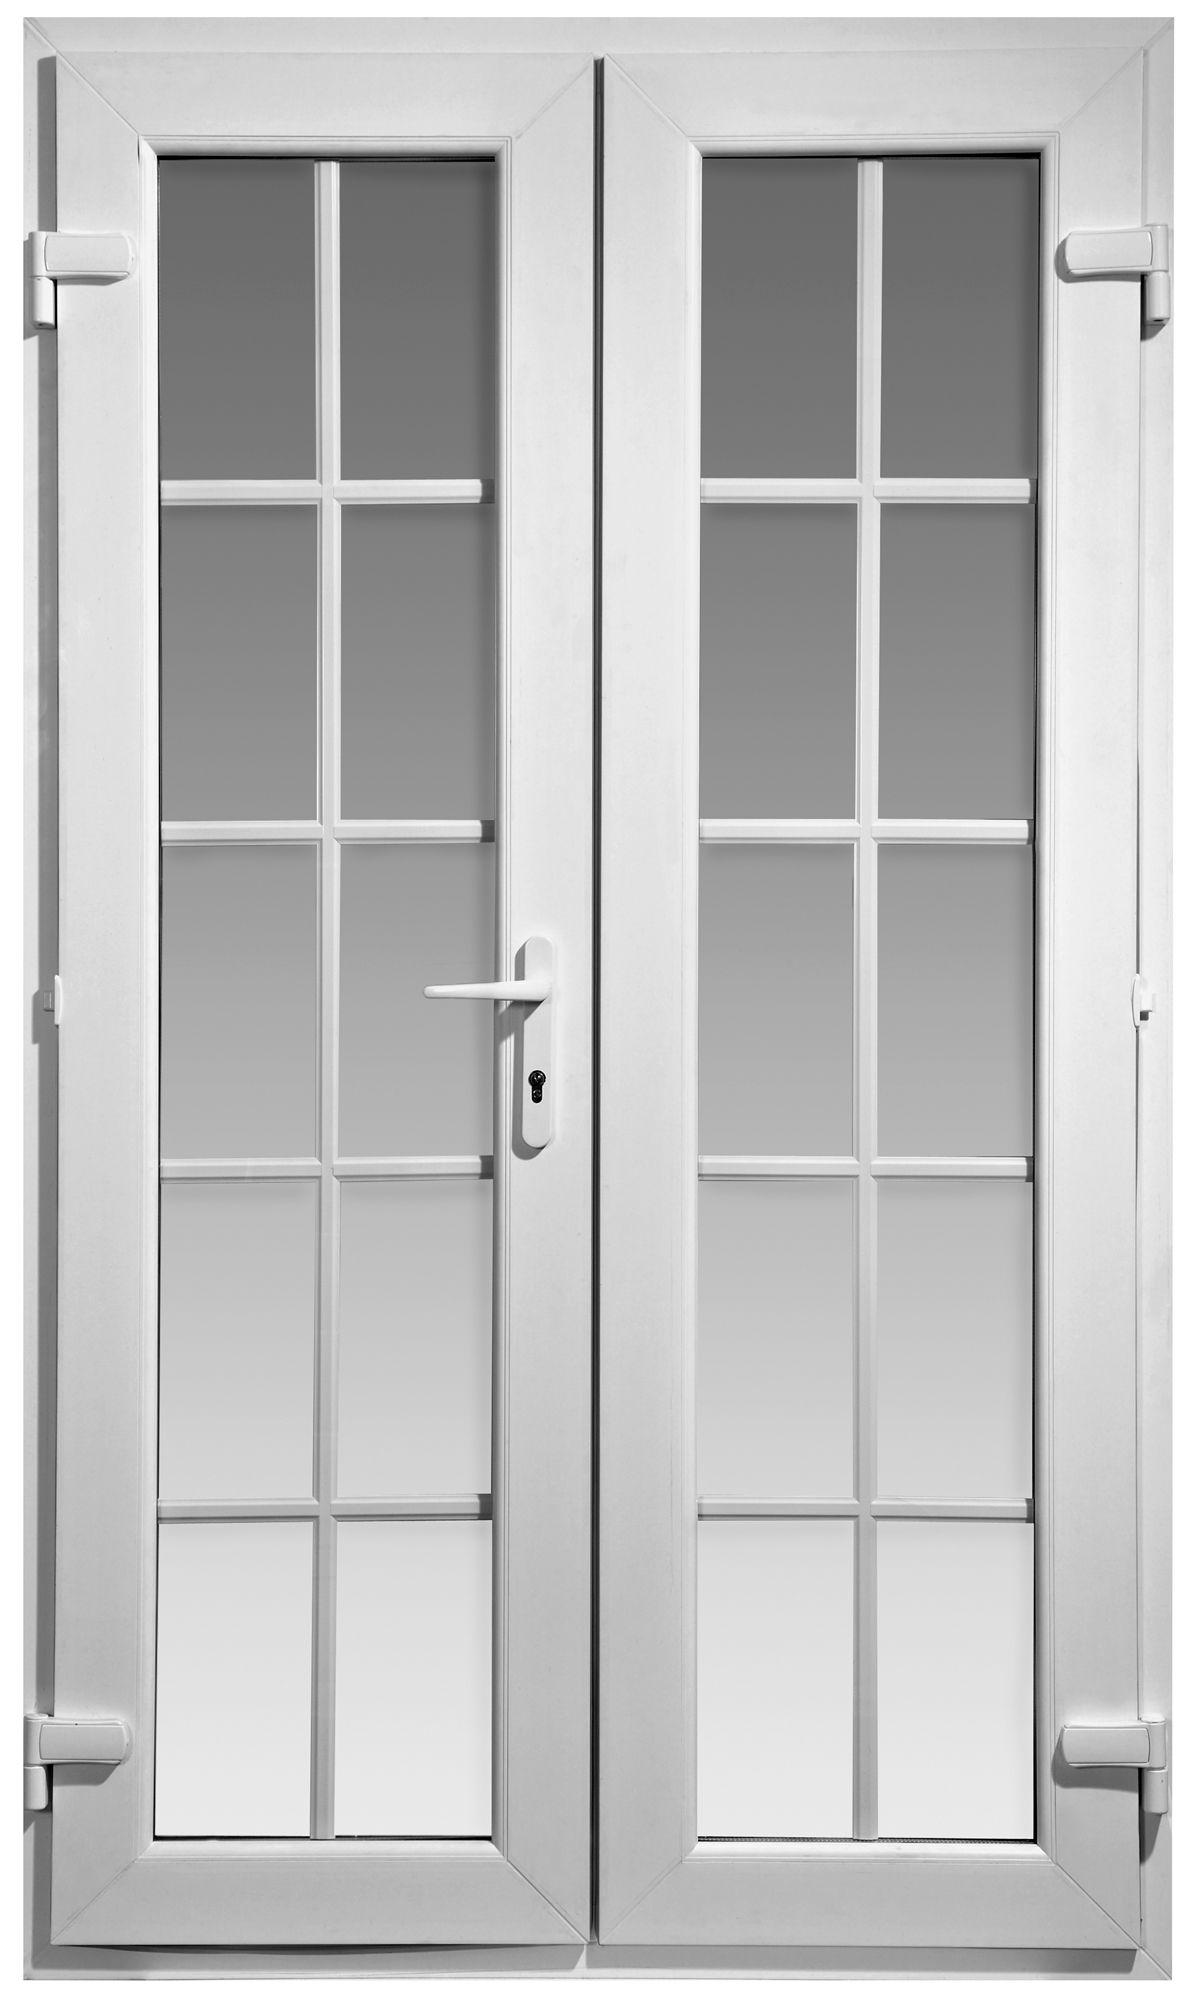 french doors interior b and q photo - 7